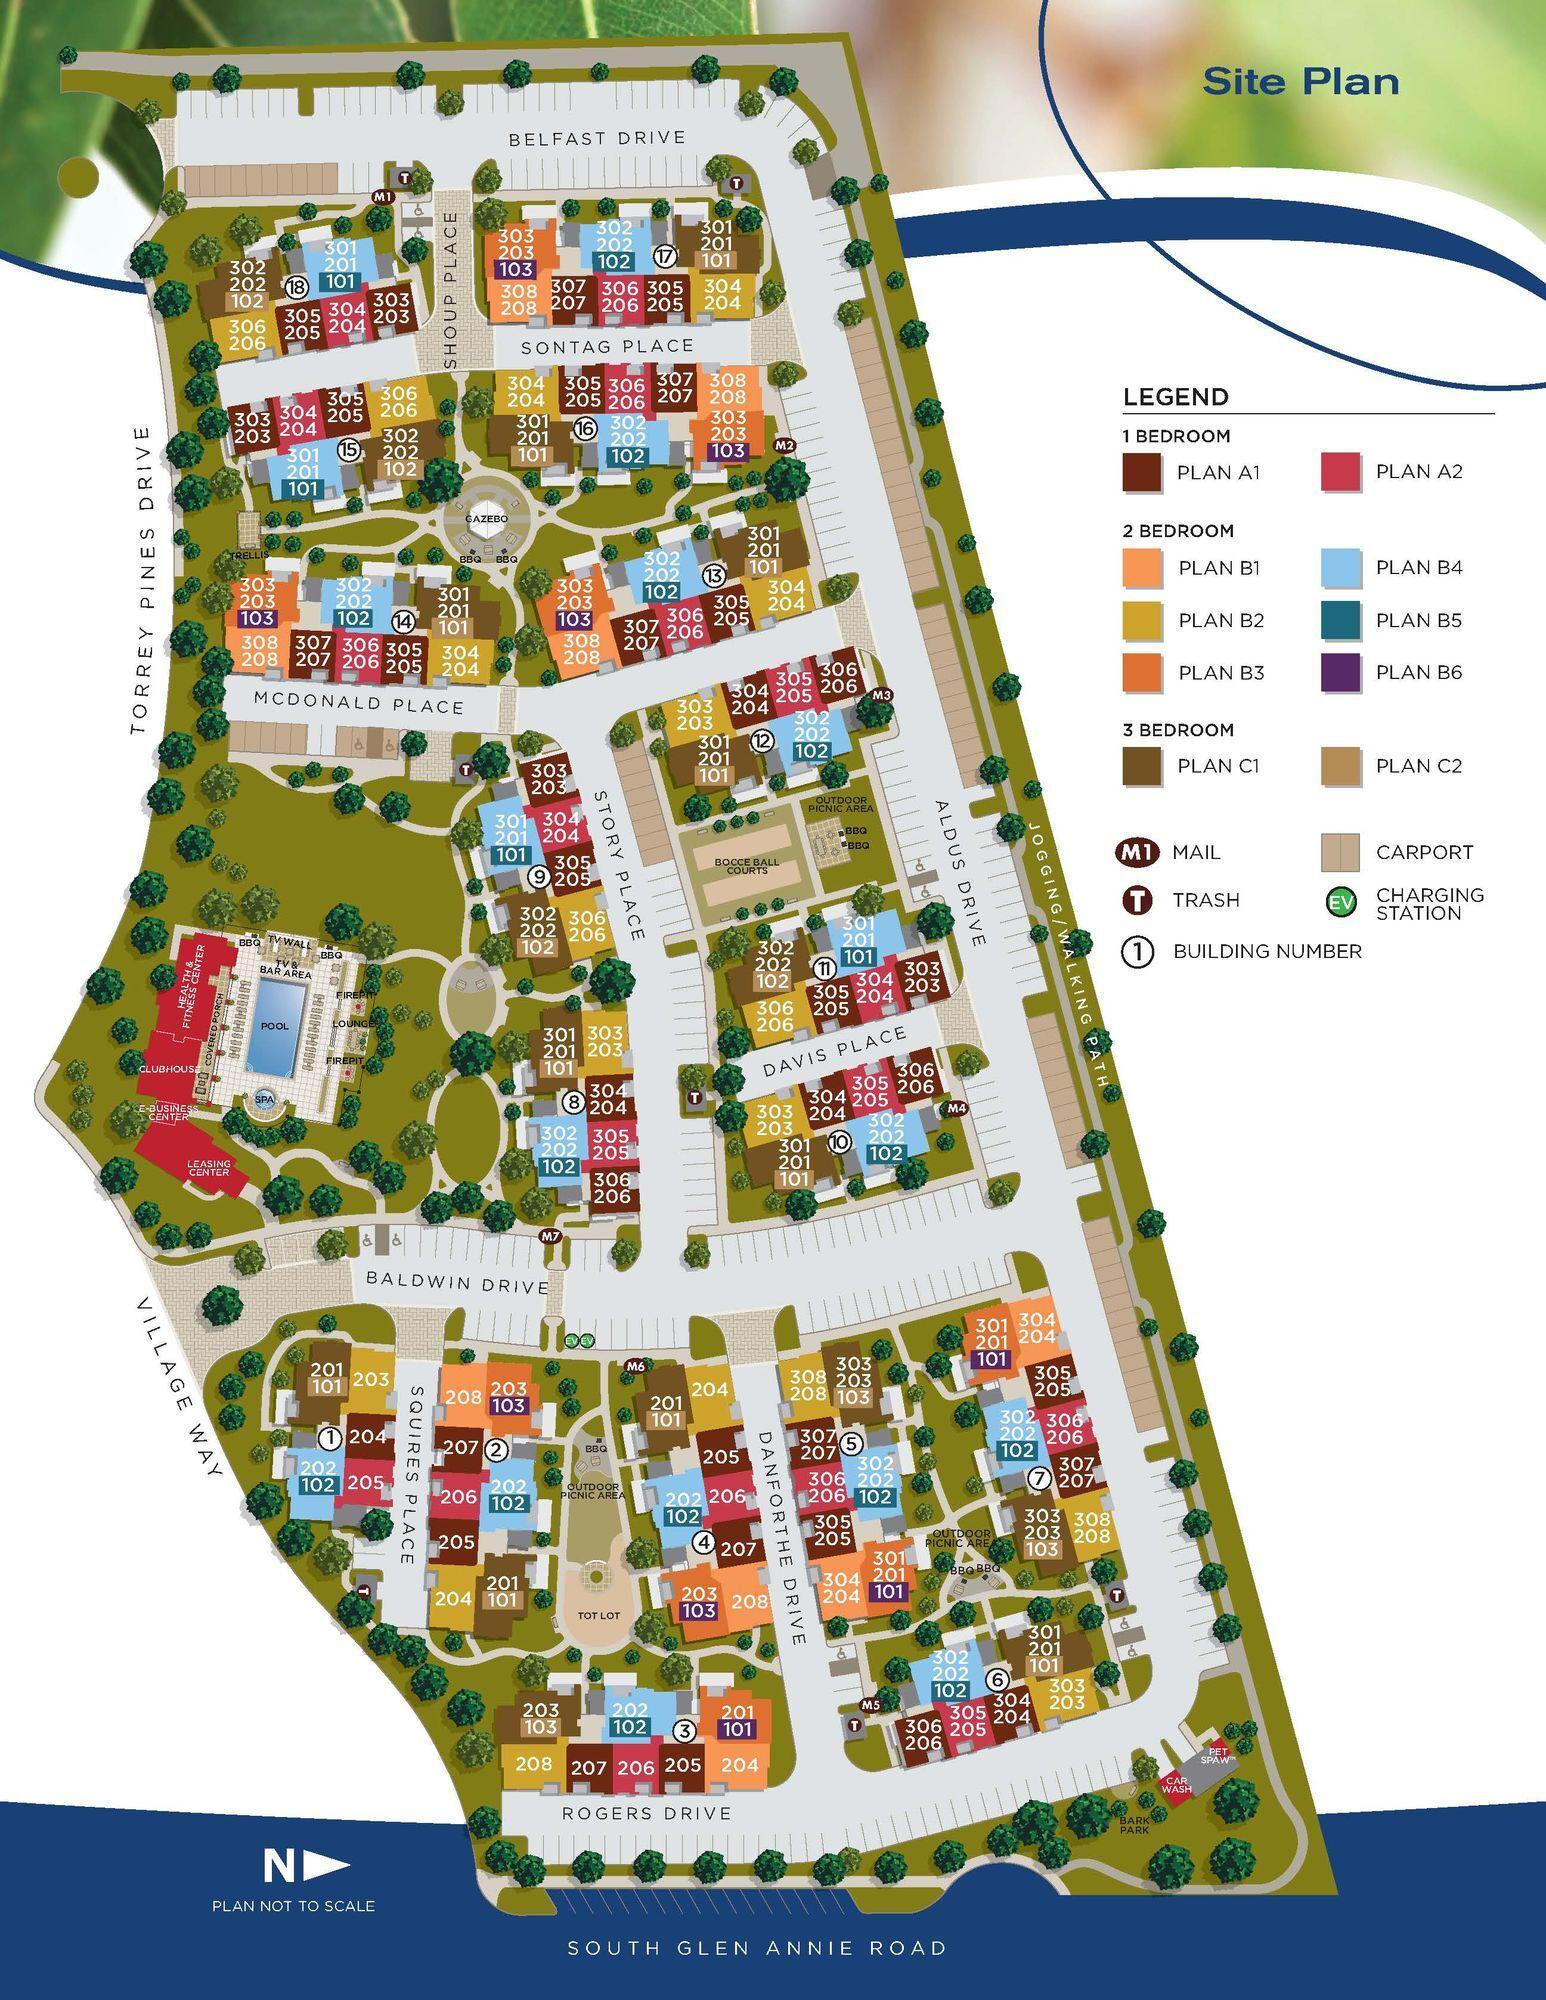 Hollister Village Apartments for Rent in Goleta, CA